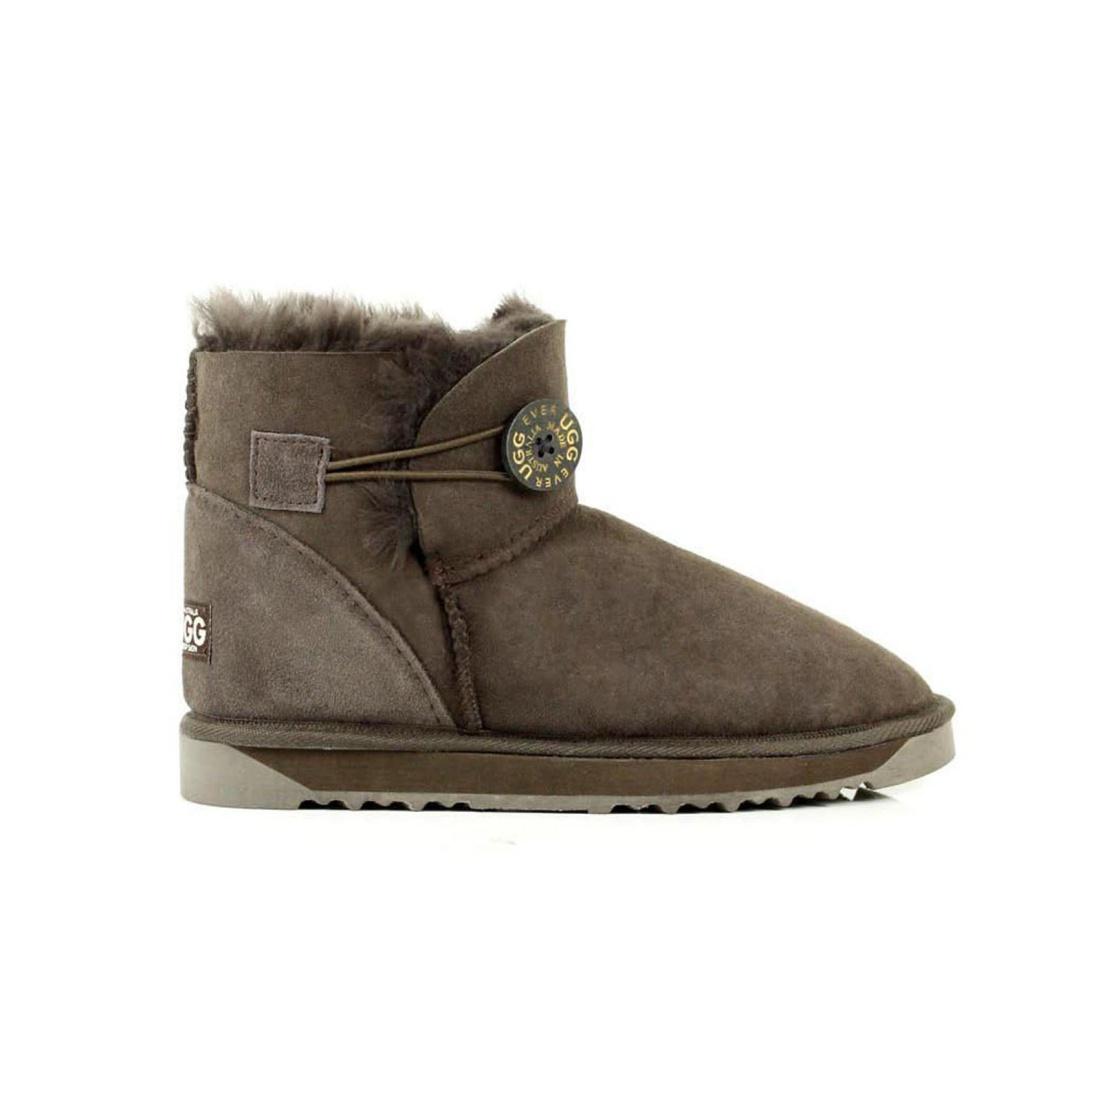 UGG Button Ankle Boots Mini - Chocolate - AU Women 4 / Men 2